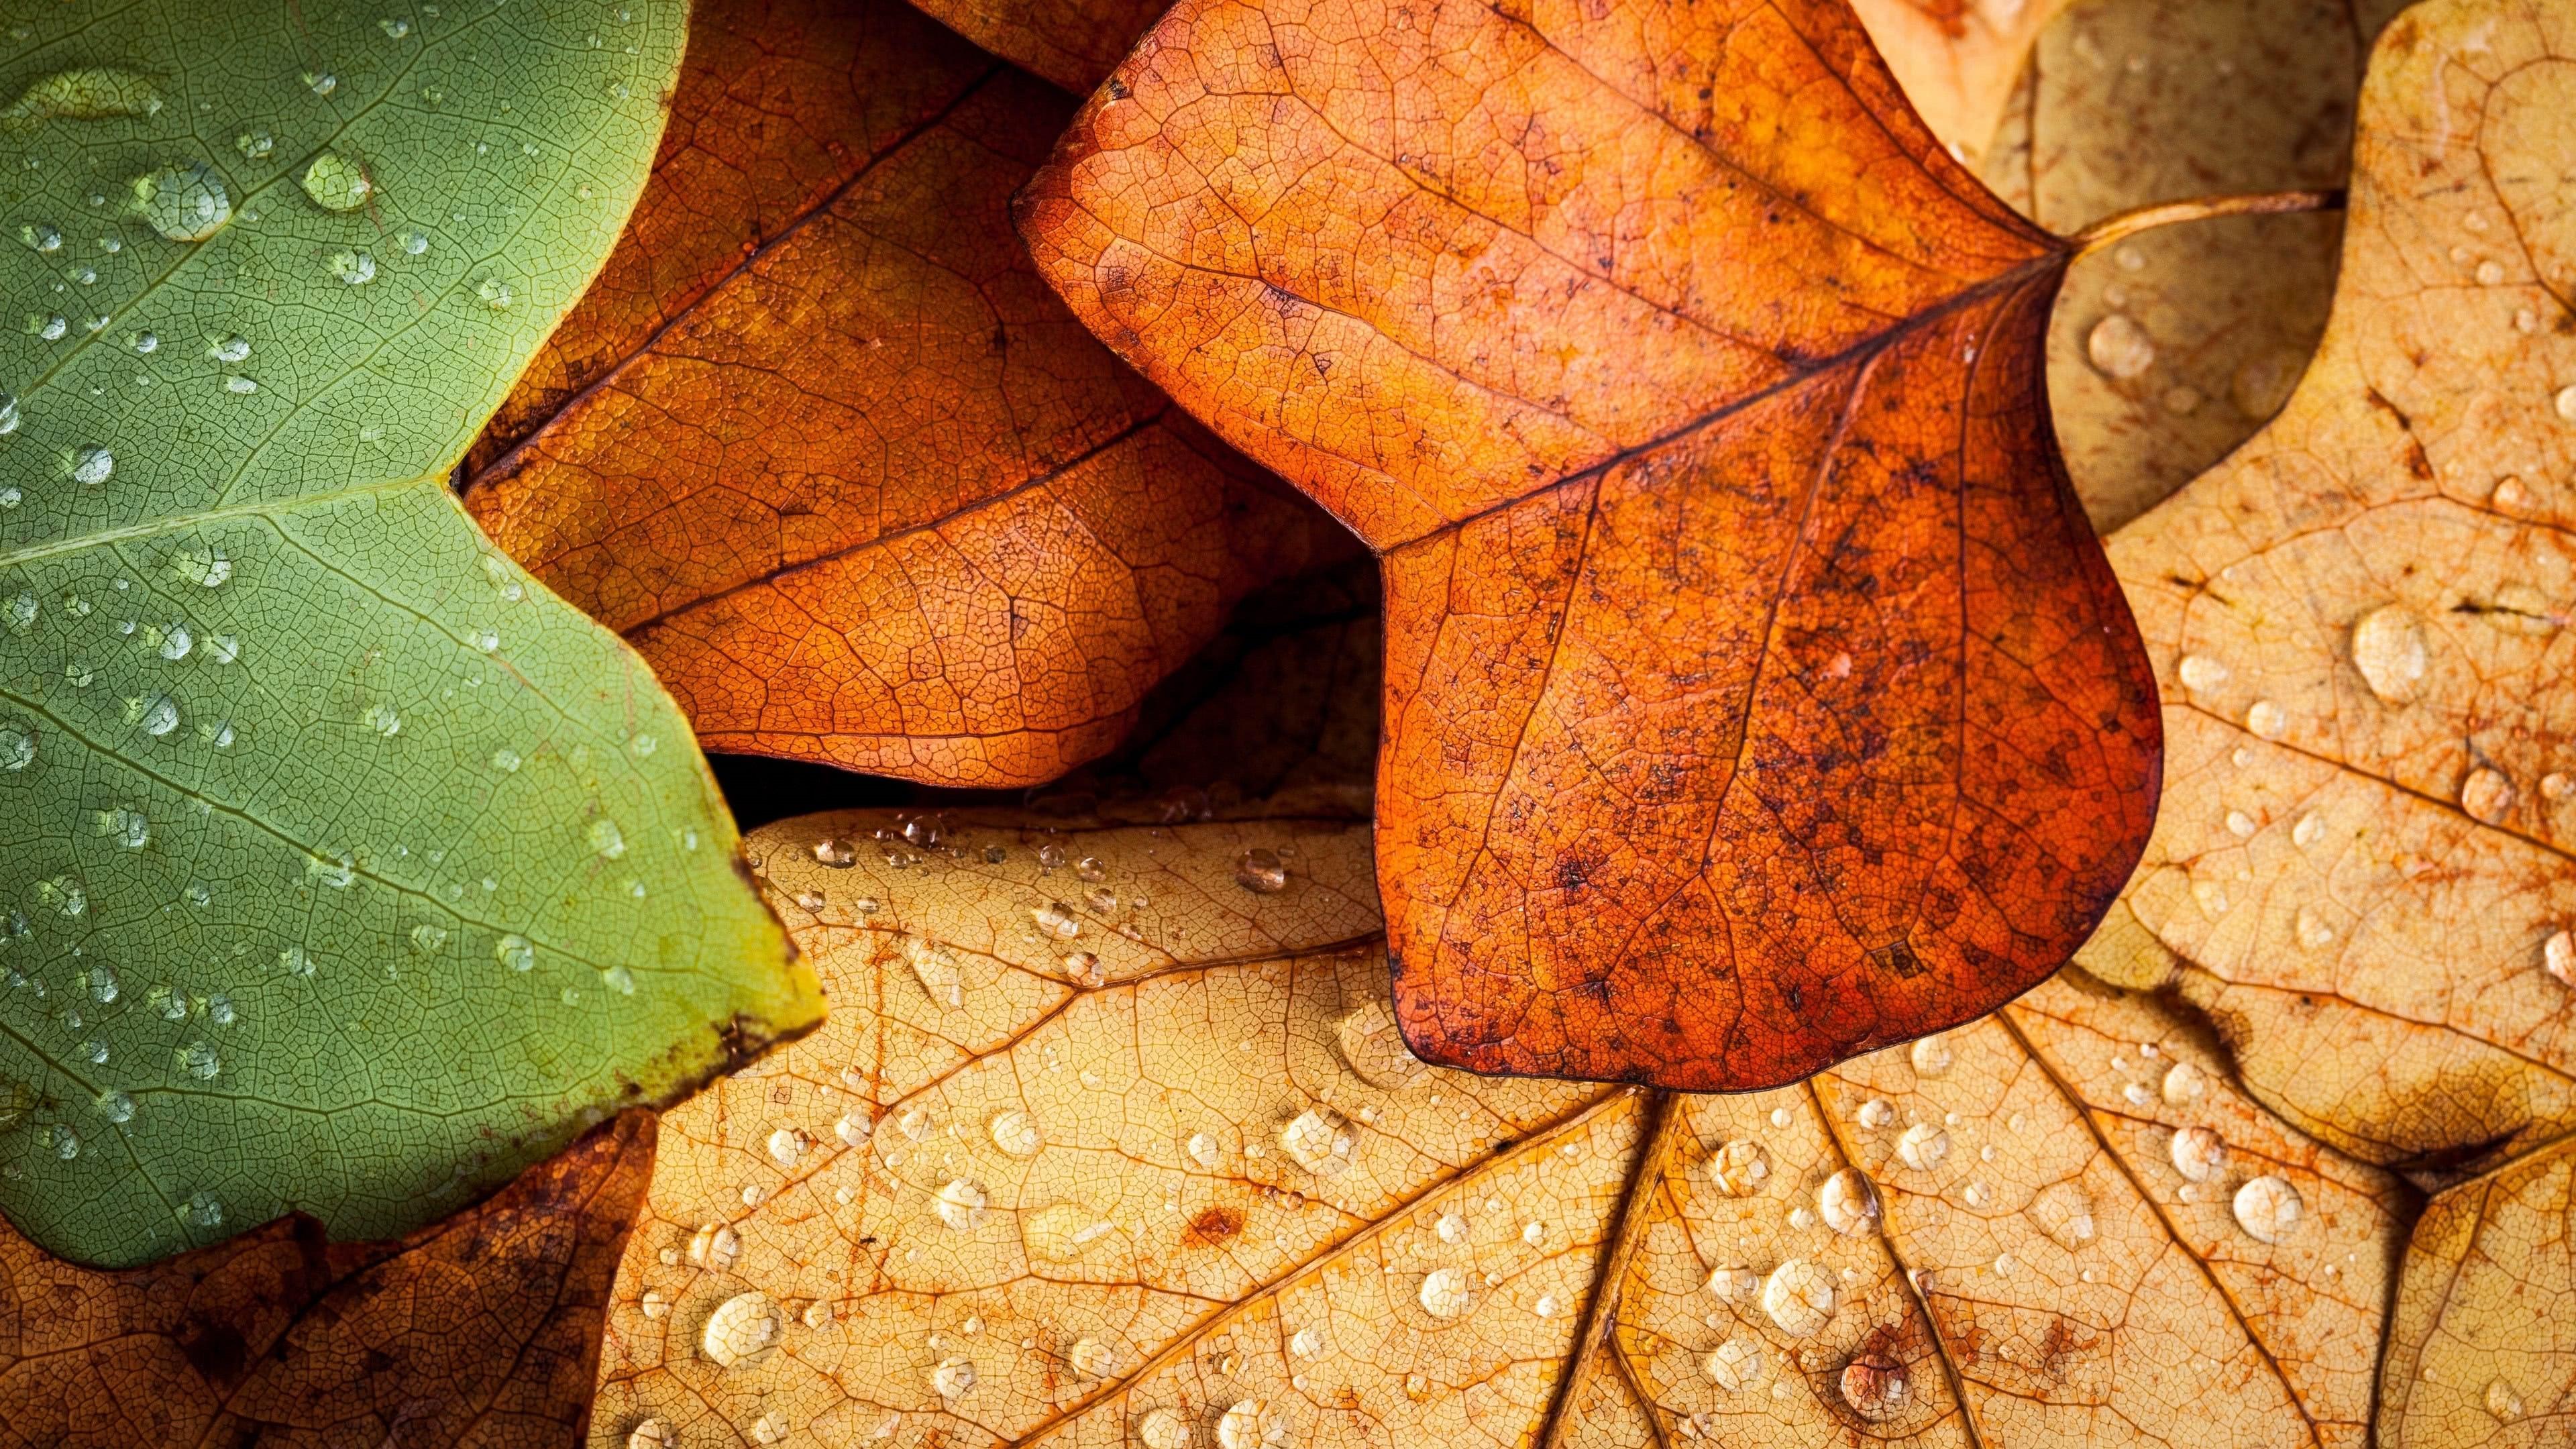 Autumn Leaves Uhd 4k Wallpaper Pixelz